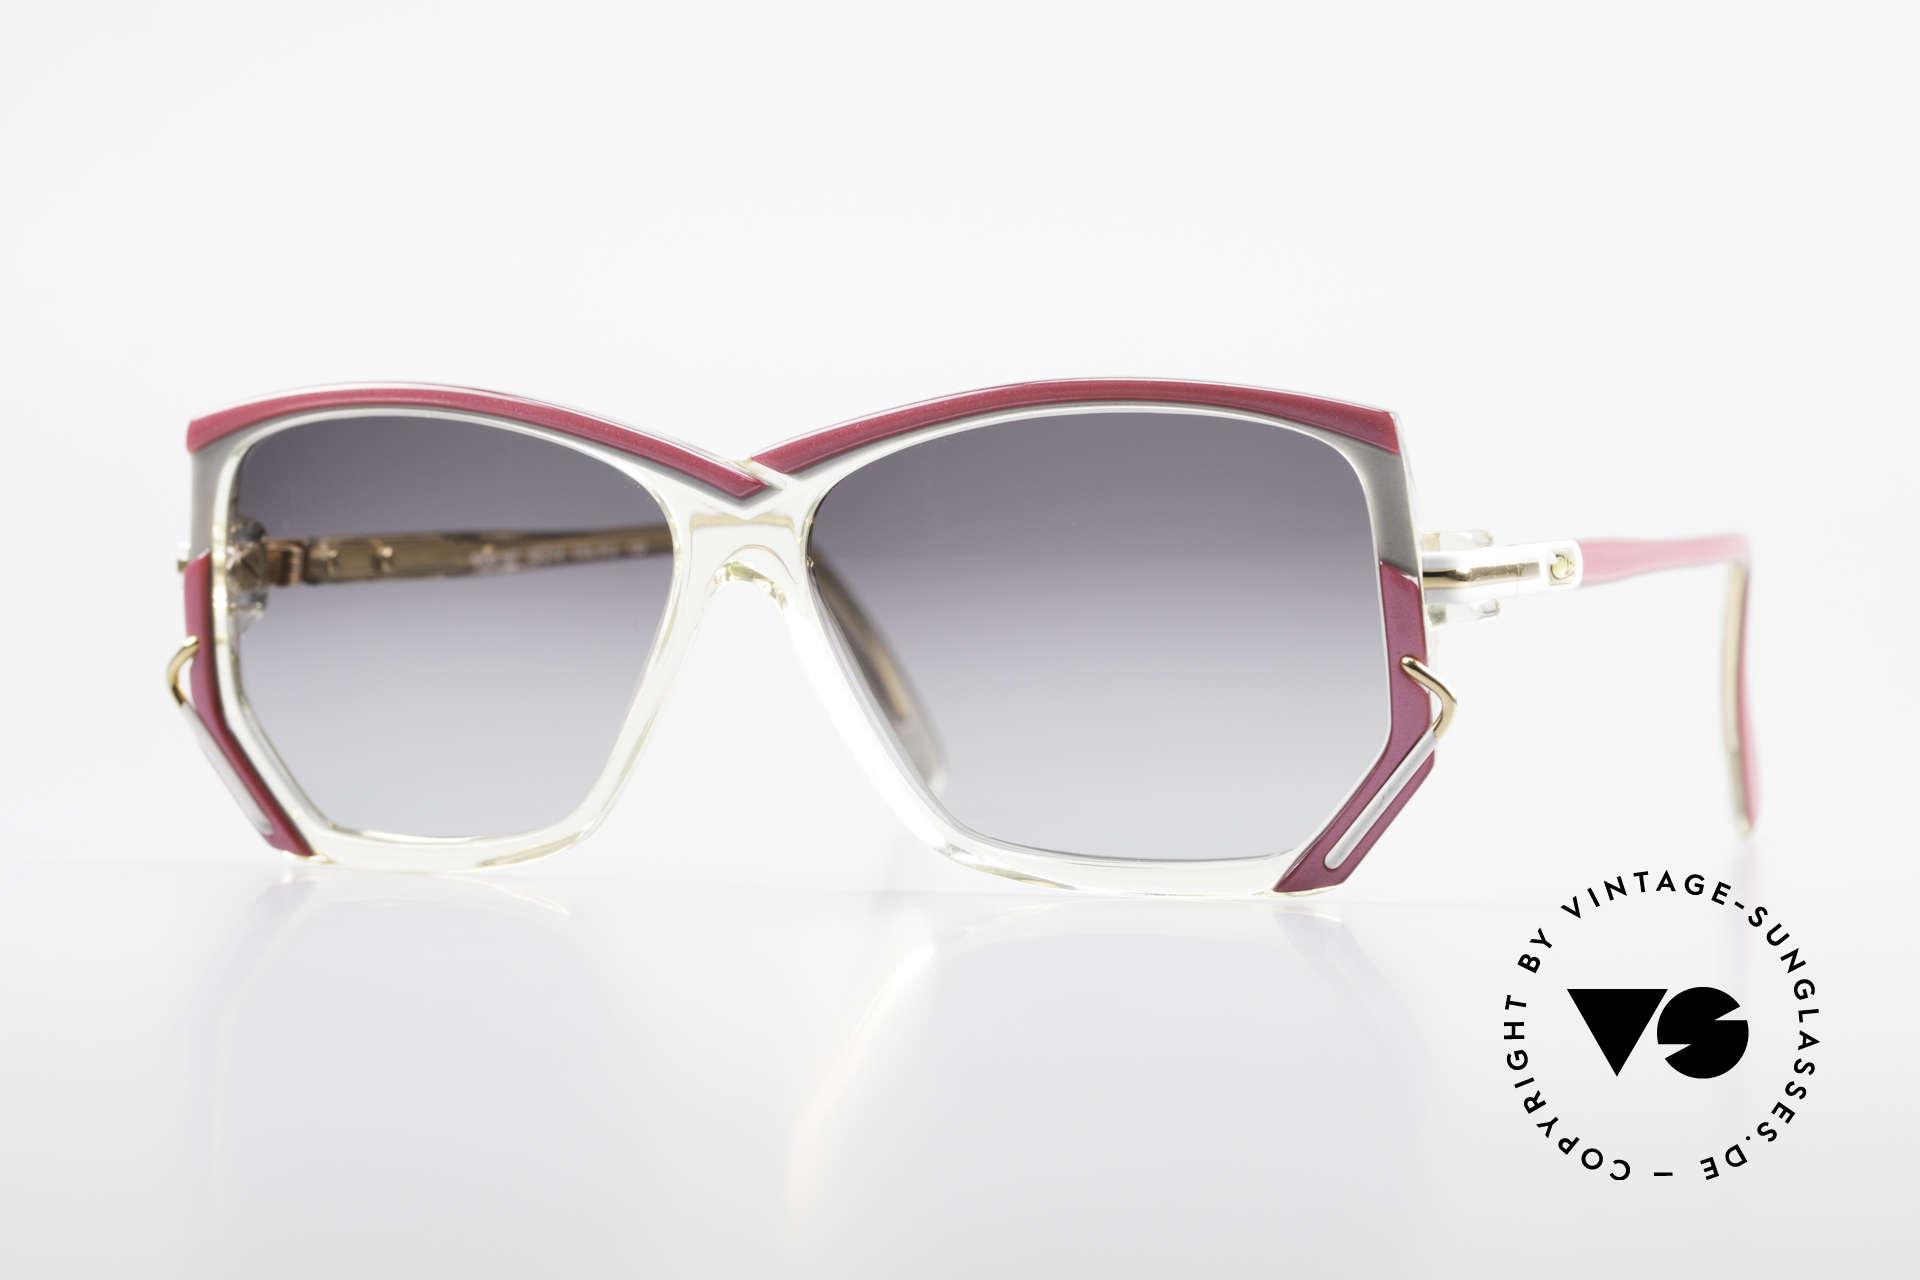 Cazal 197 80's Designer Sunglasses, original vintage CAZAL sunglasses from W.Germany, Made for Women